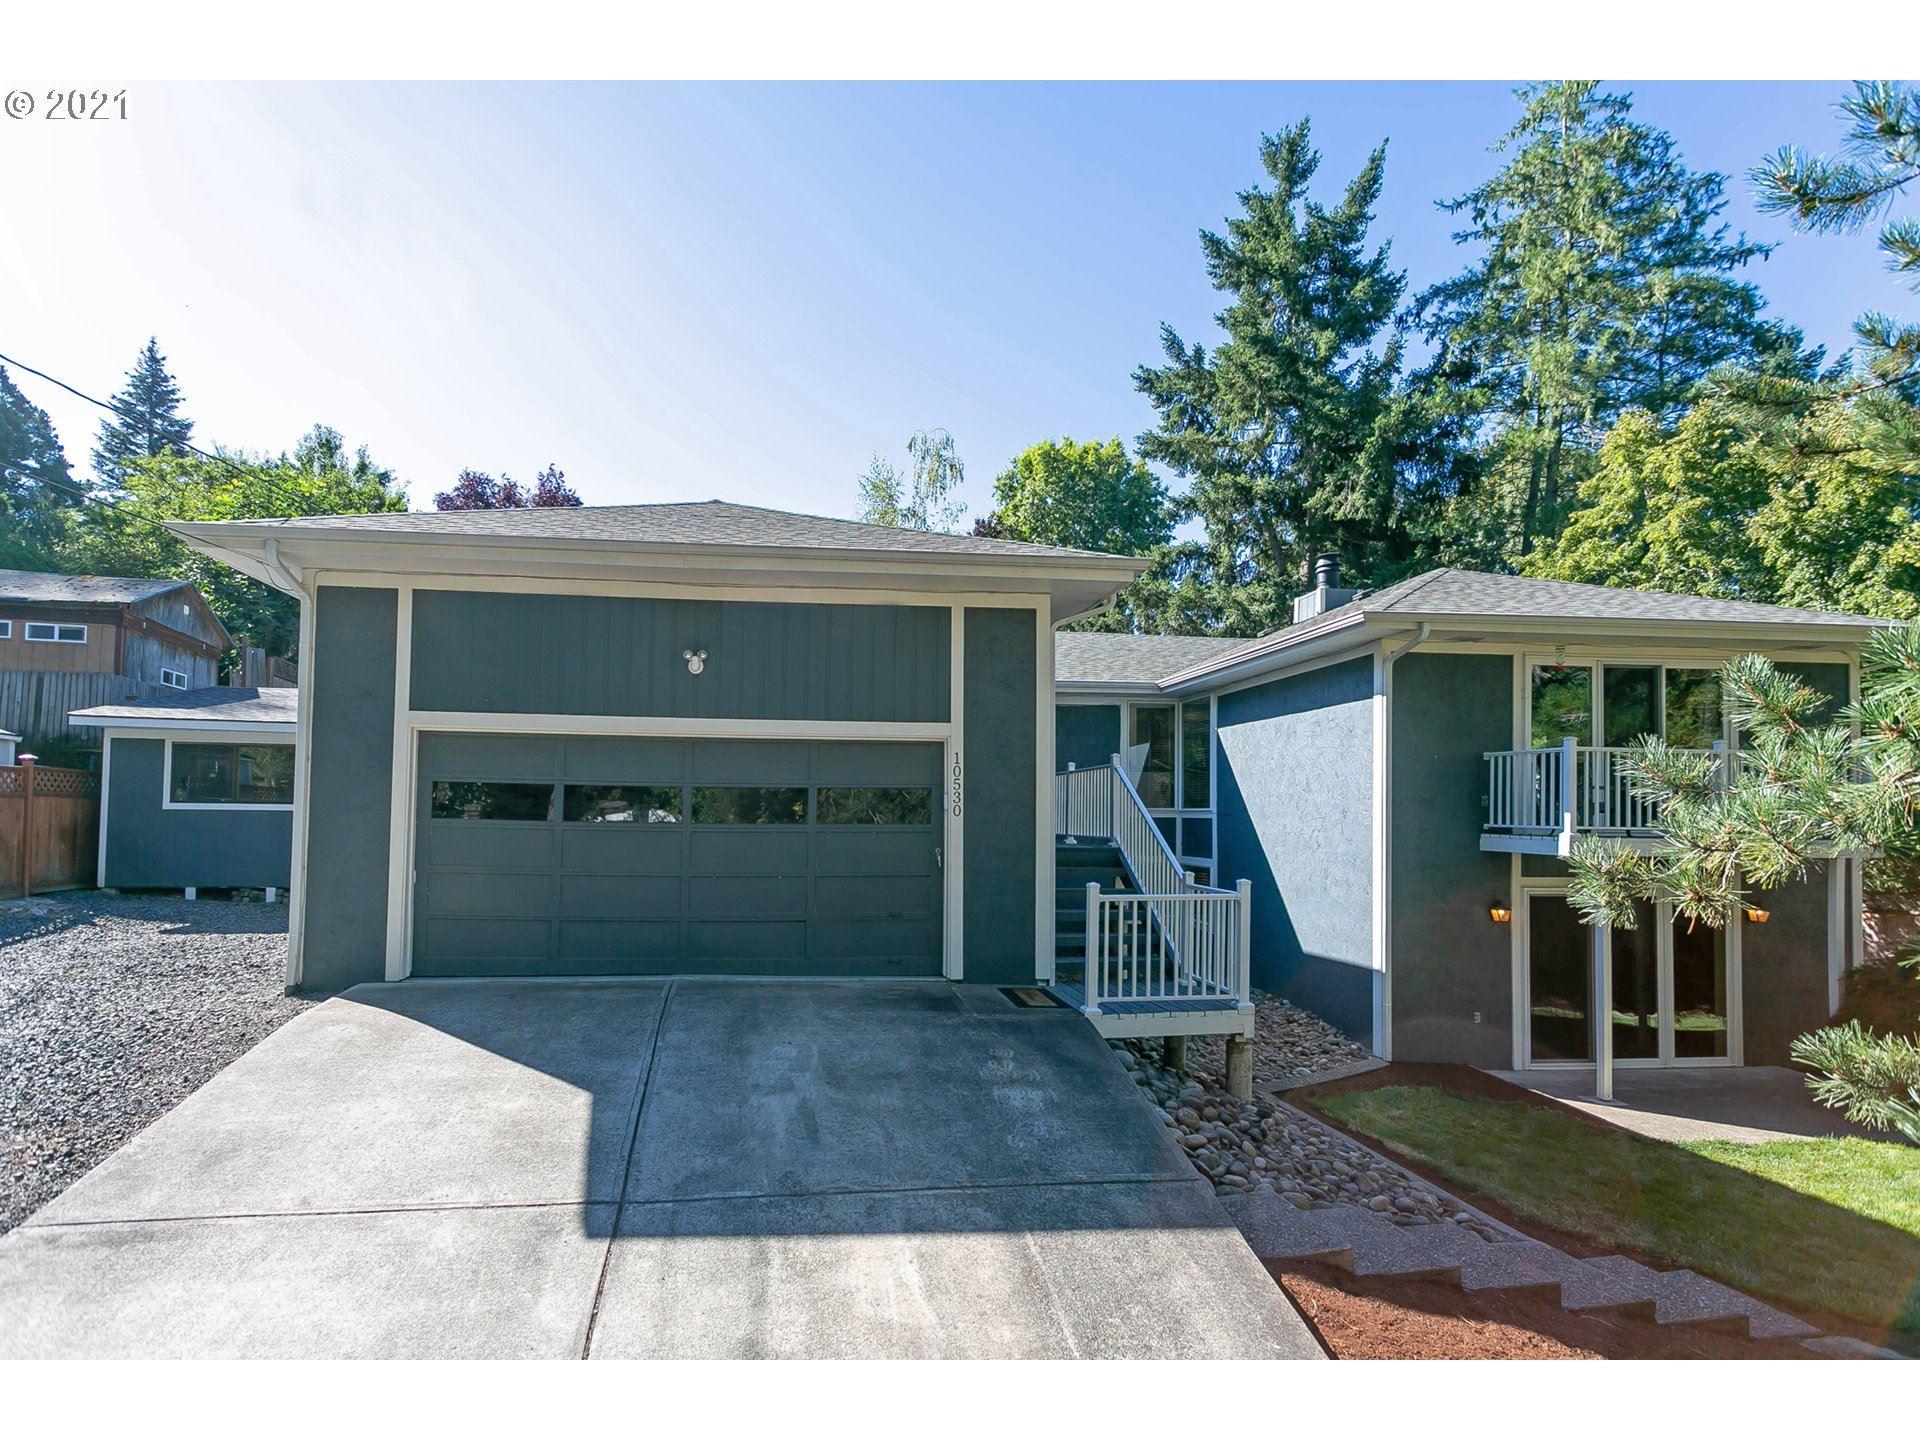 10530 NW LEAHY RD, Portland, OR 97229 - MLS#: 21671871